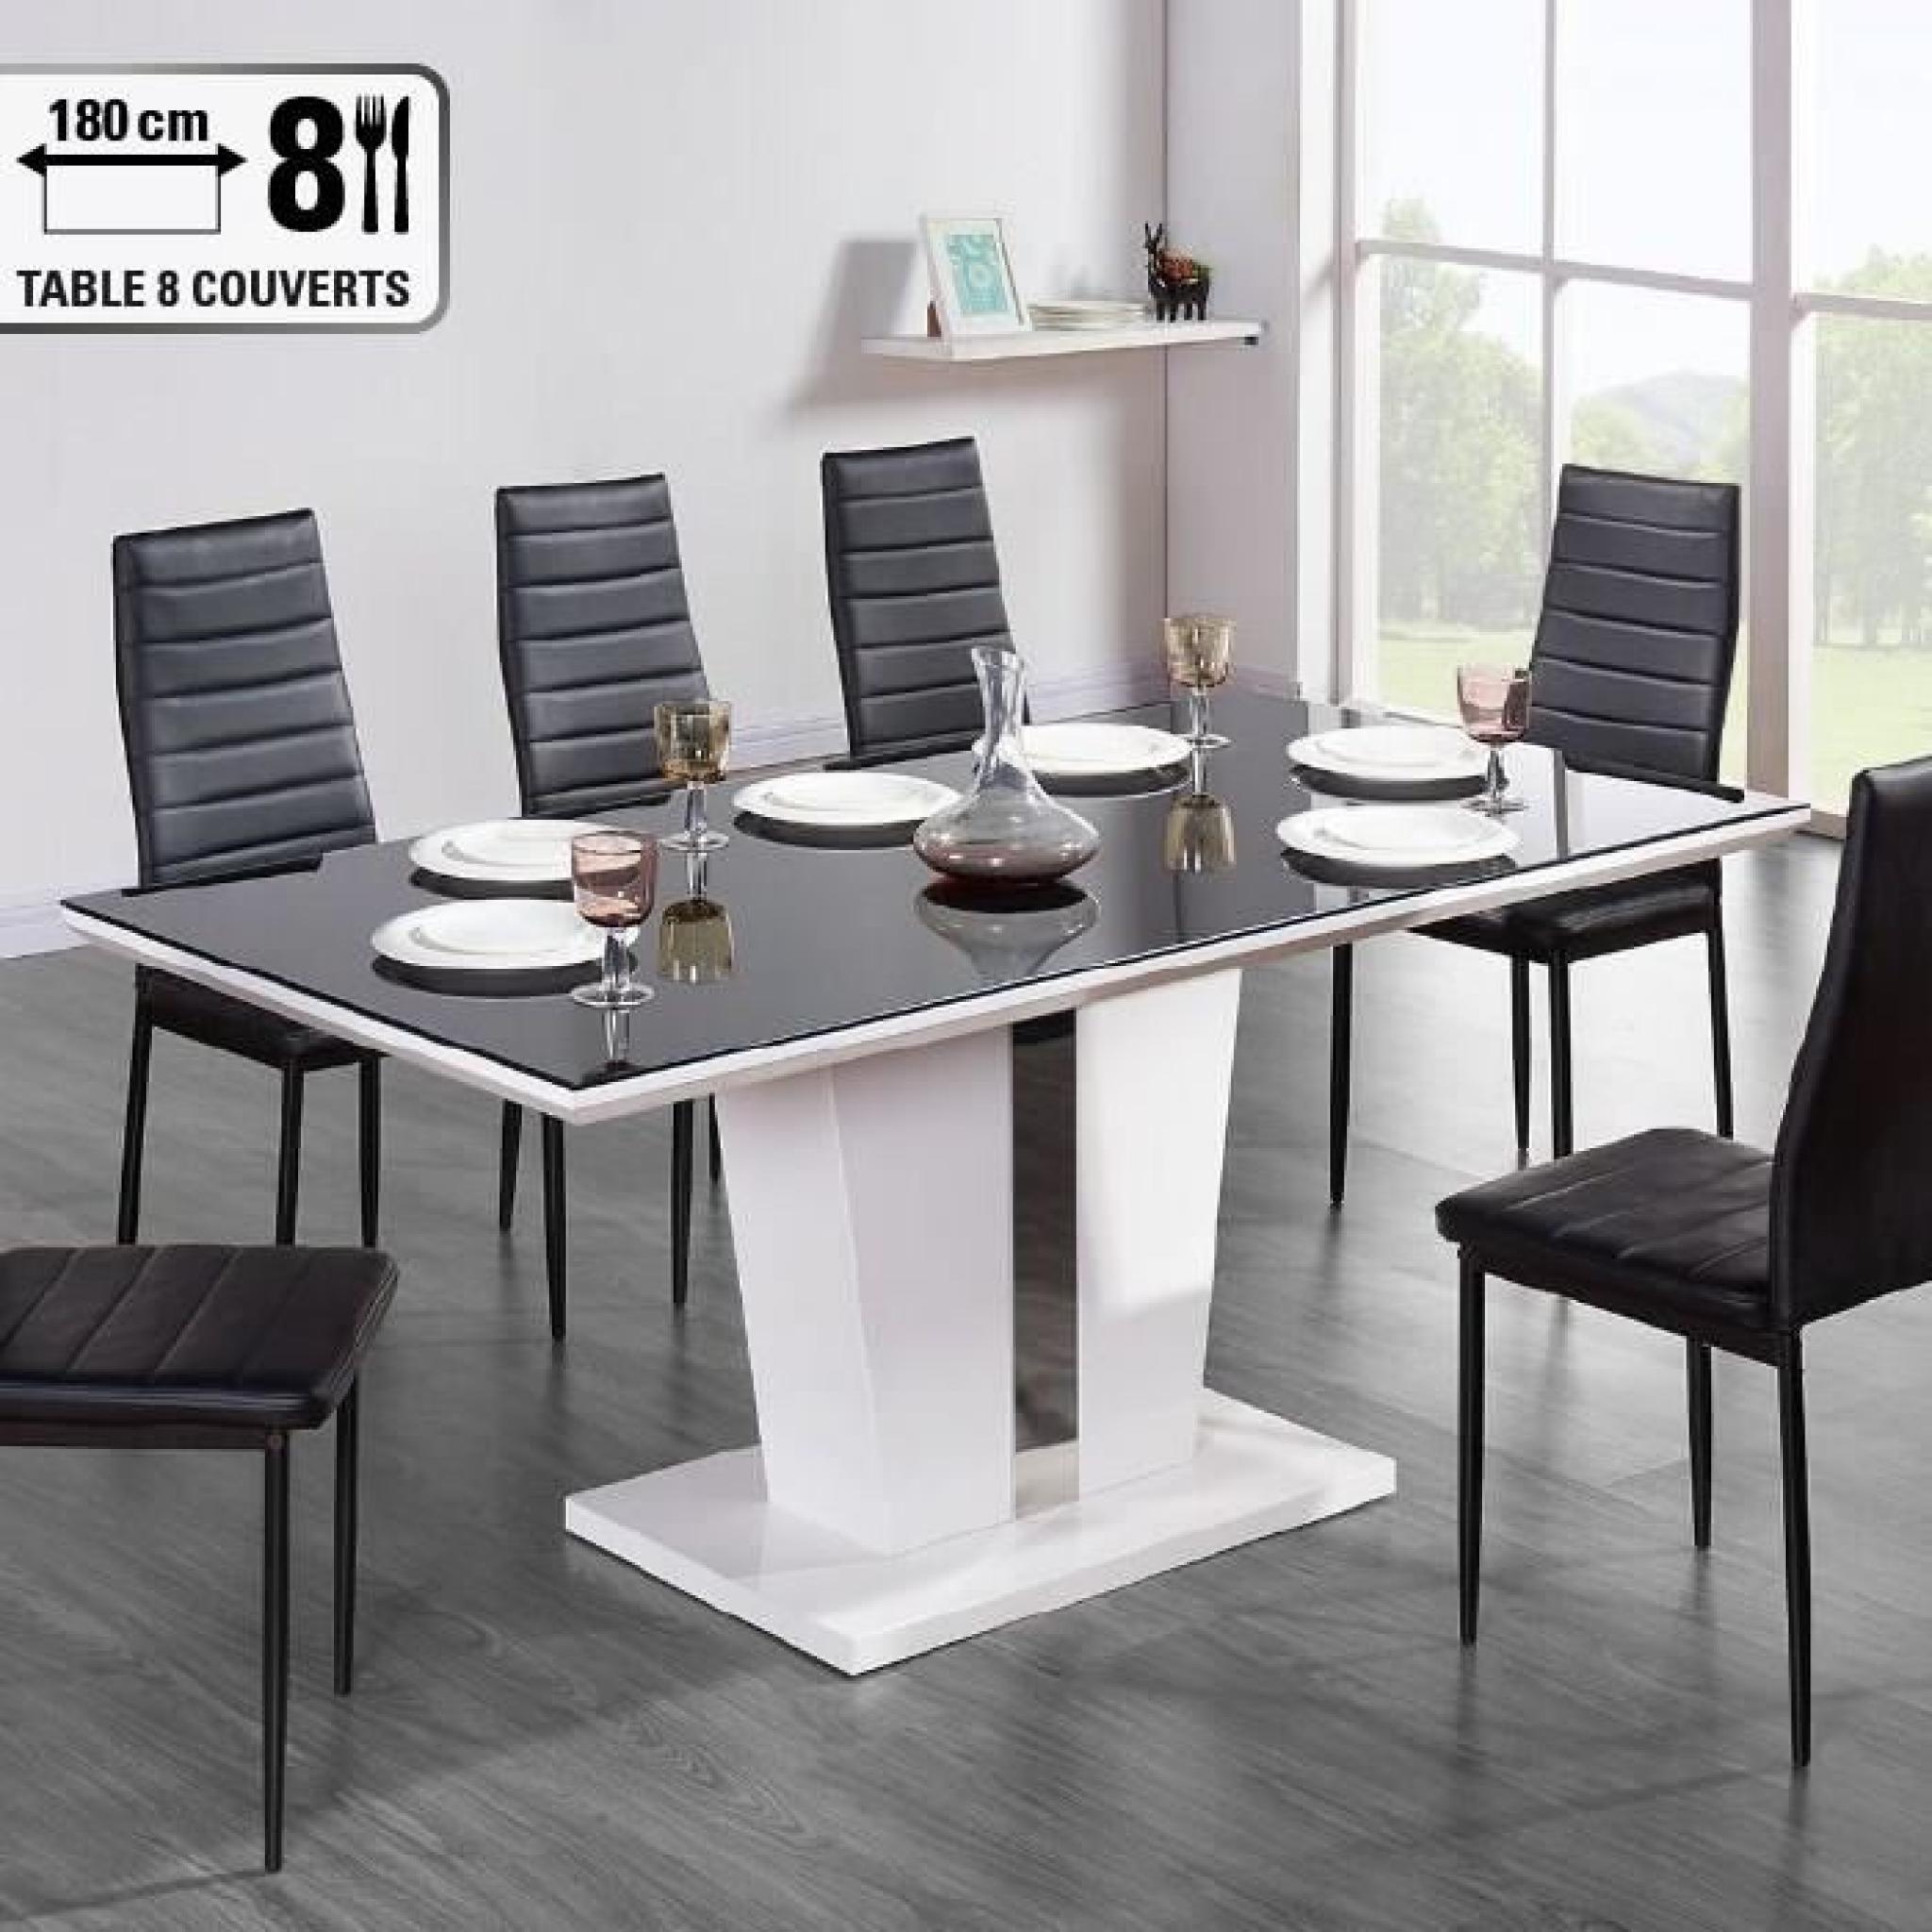 trevise table manger 180x90cm noir et laqu blanc. Black Bedroom Furniture Sets. Home Design Ideas